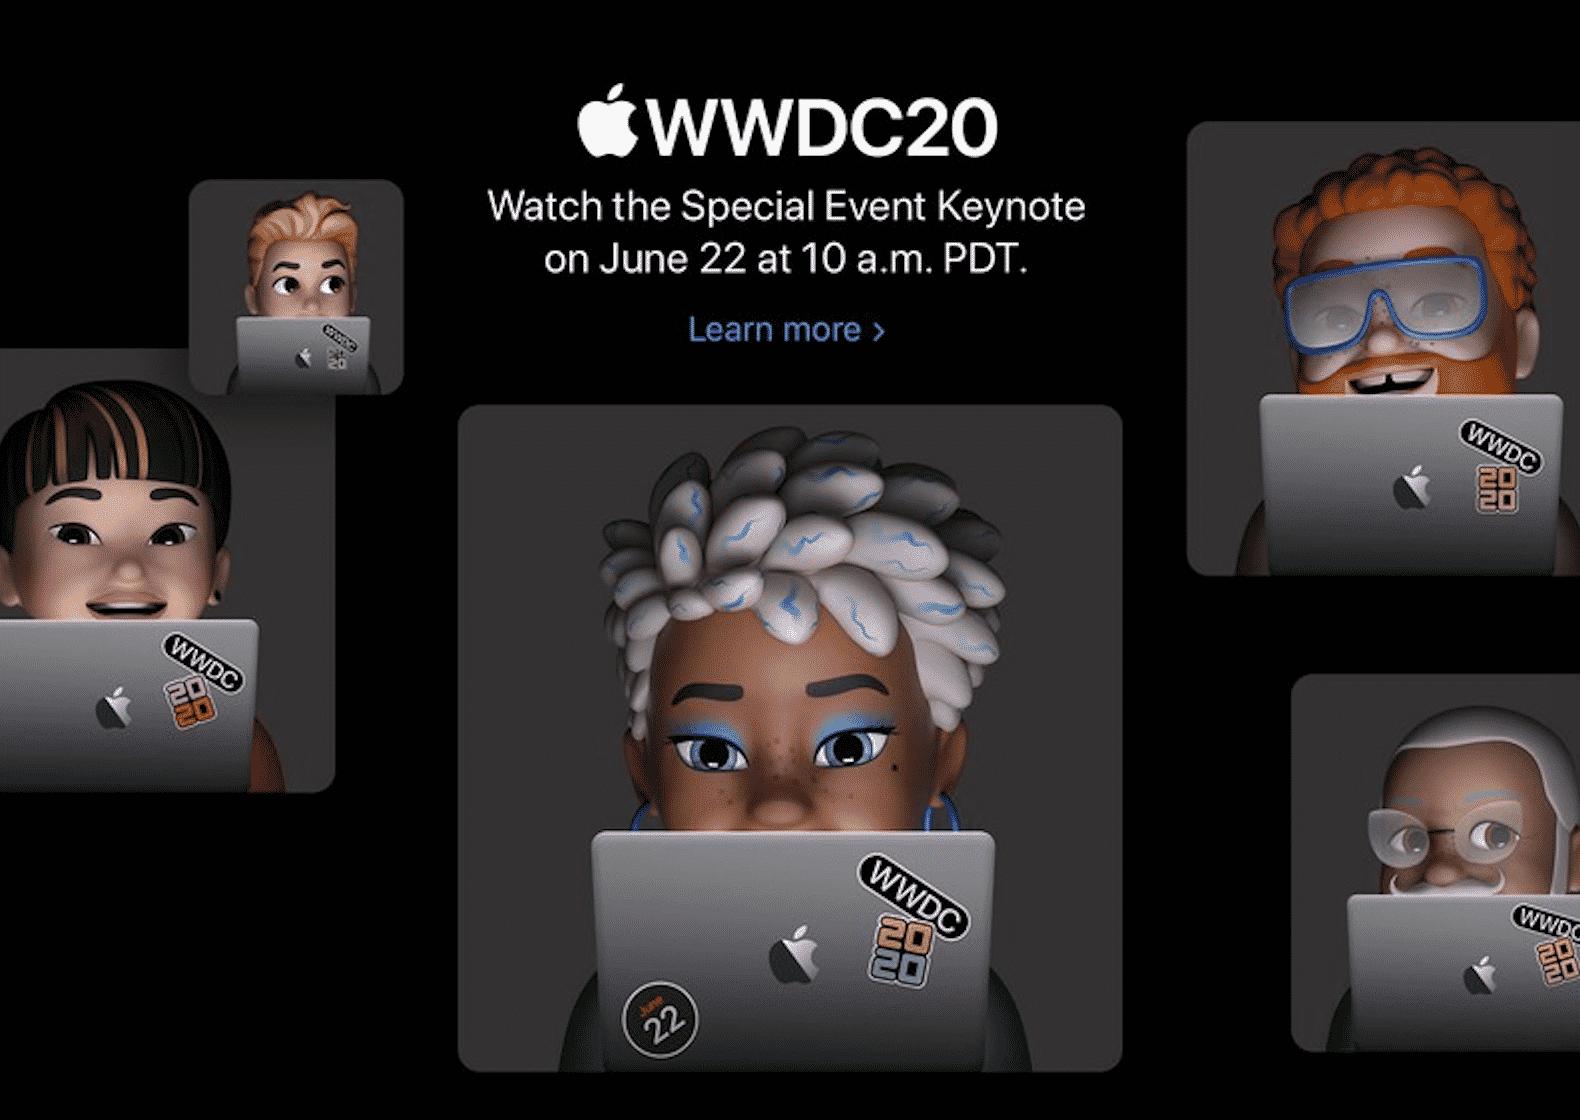 WWDC 2020 event